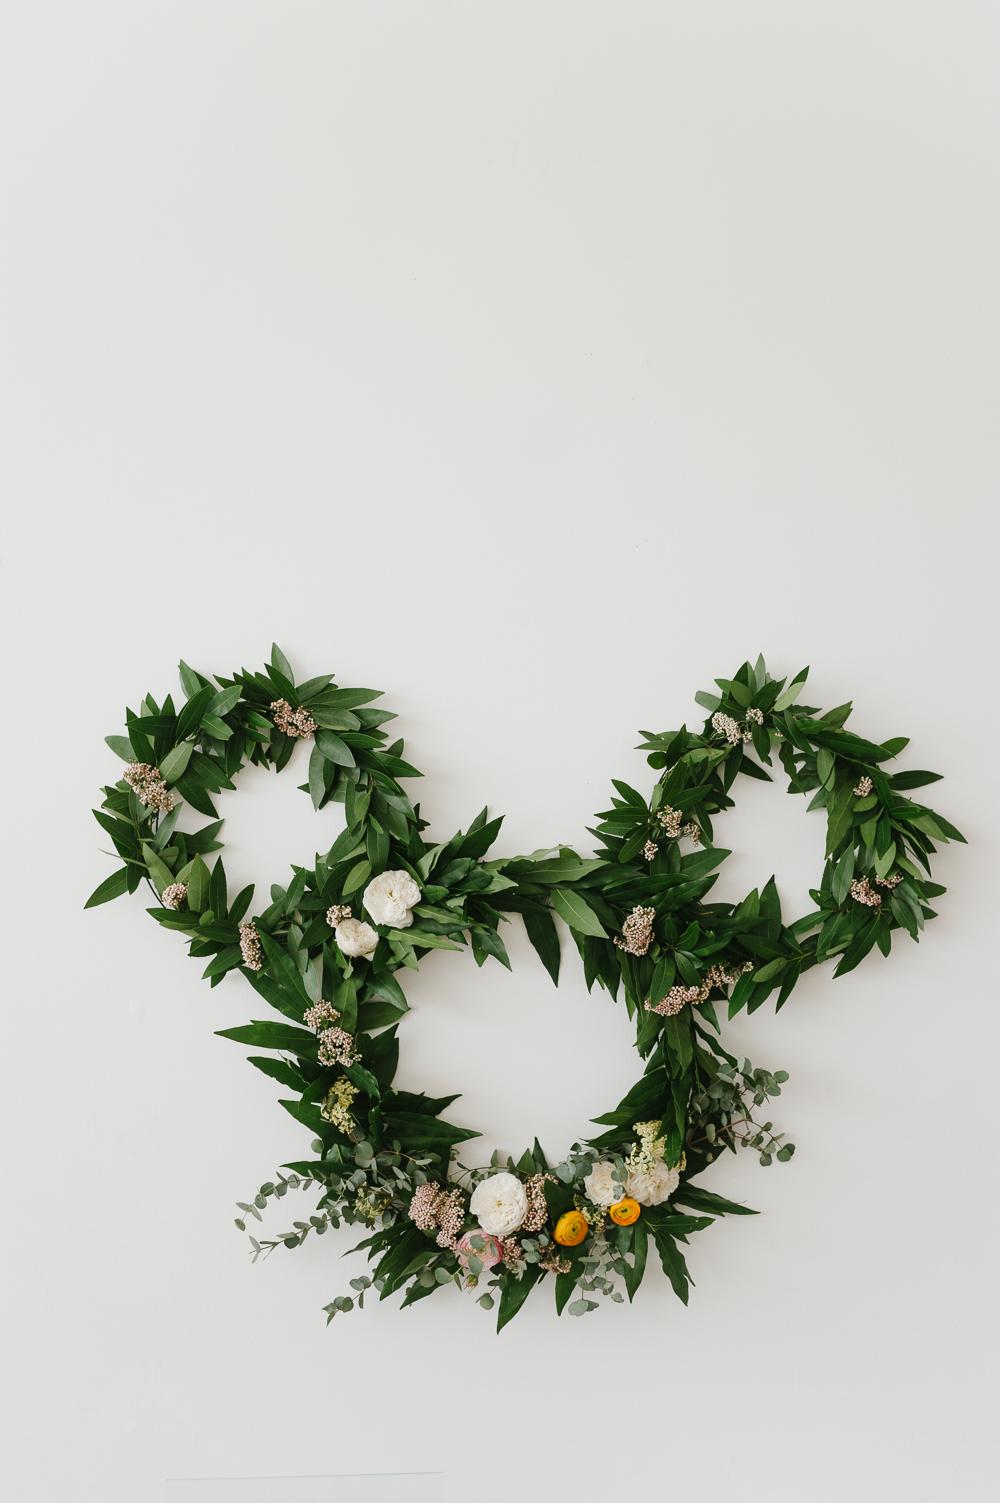 BEIJOS_DISNEY 2018-1.jpg